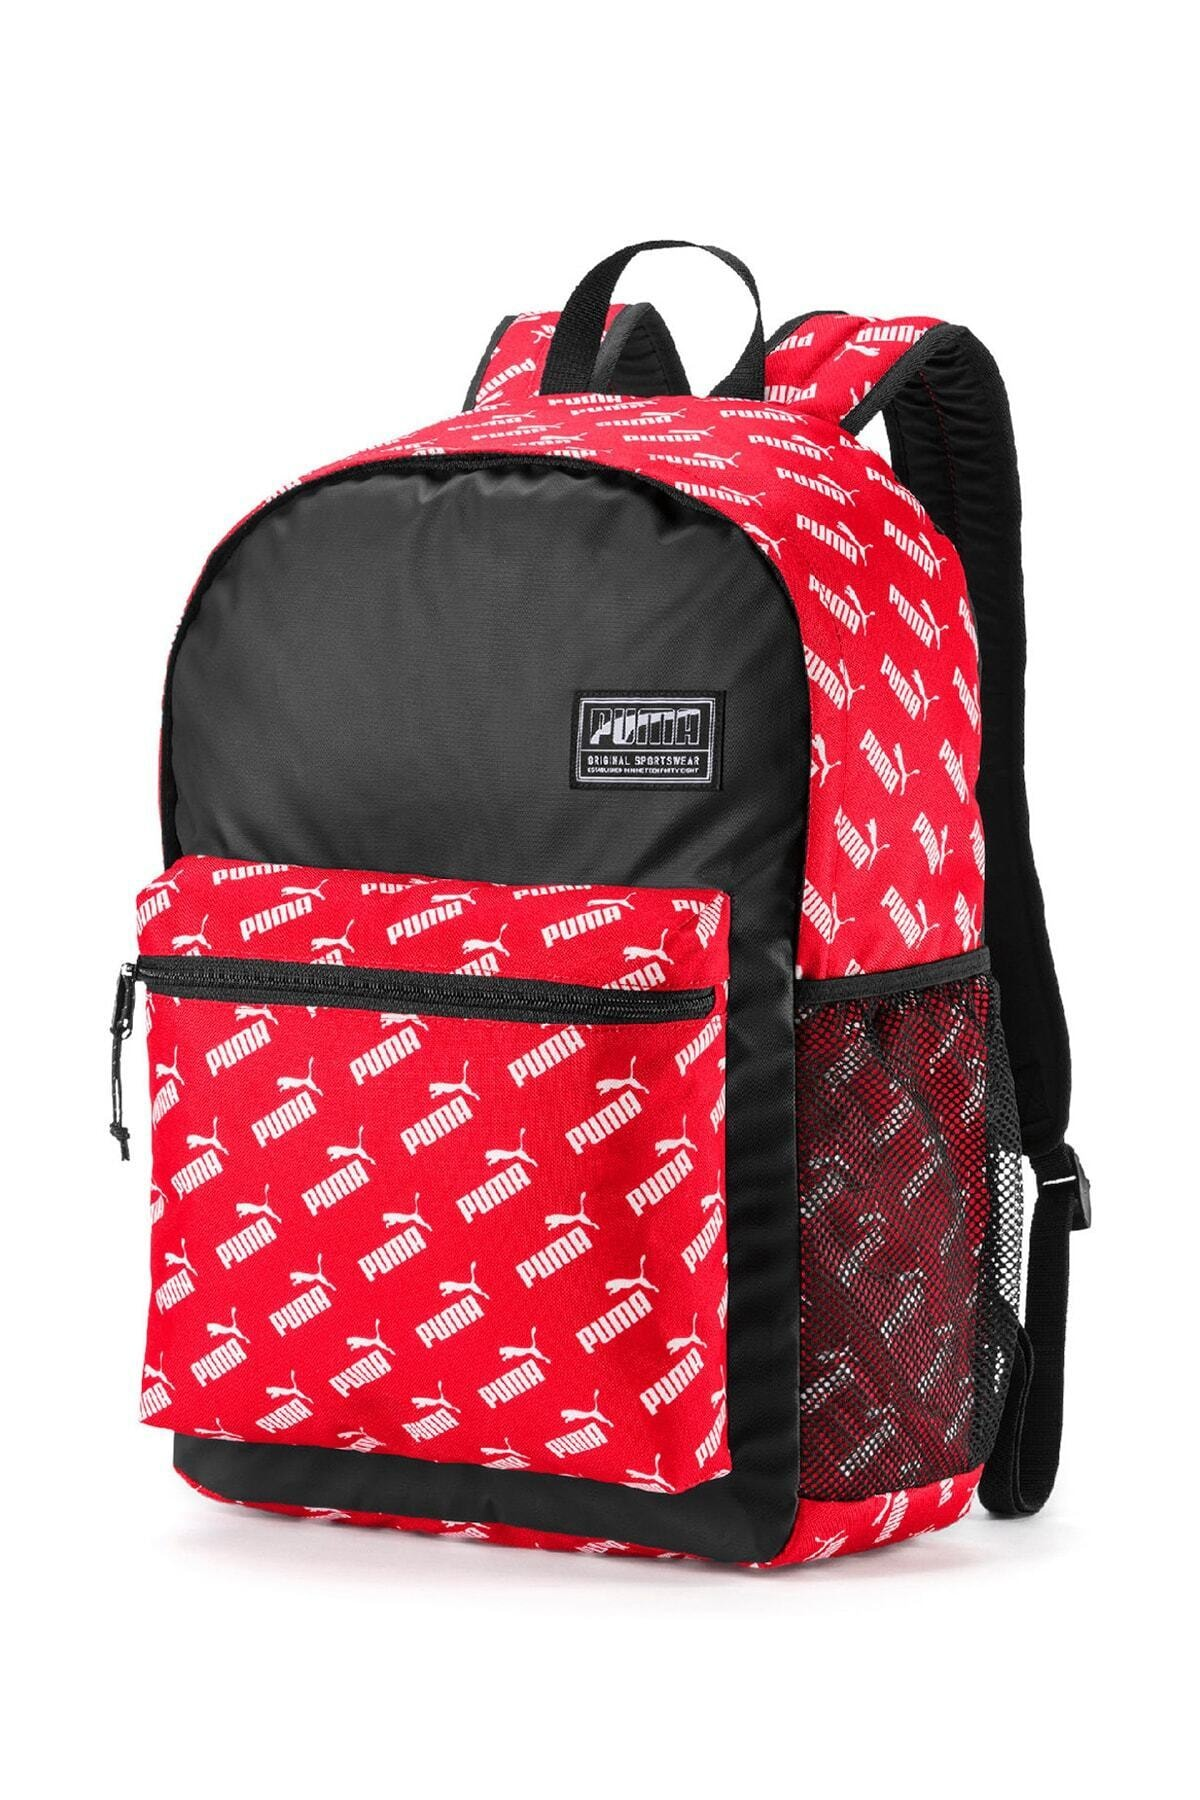 Puma Unisex Sırt Çantası - PUMA Academy Backpack - 07573326 1